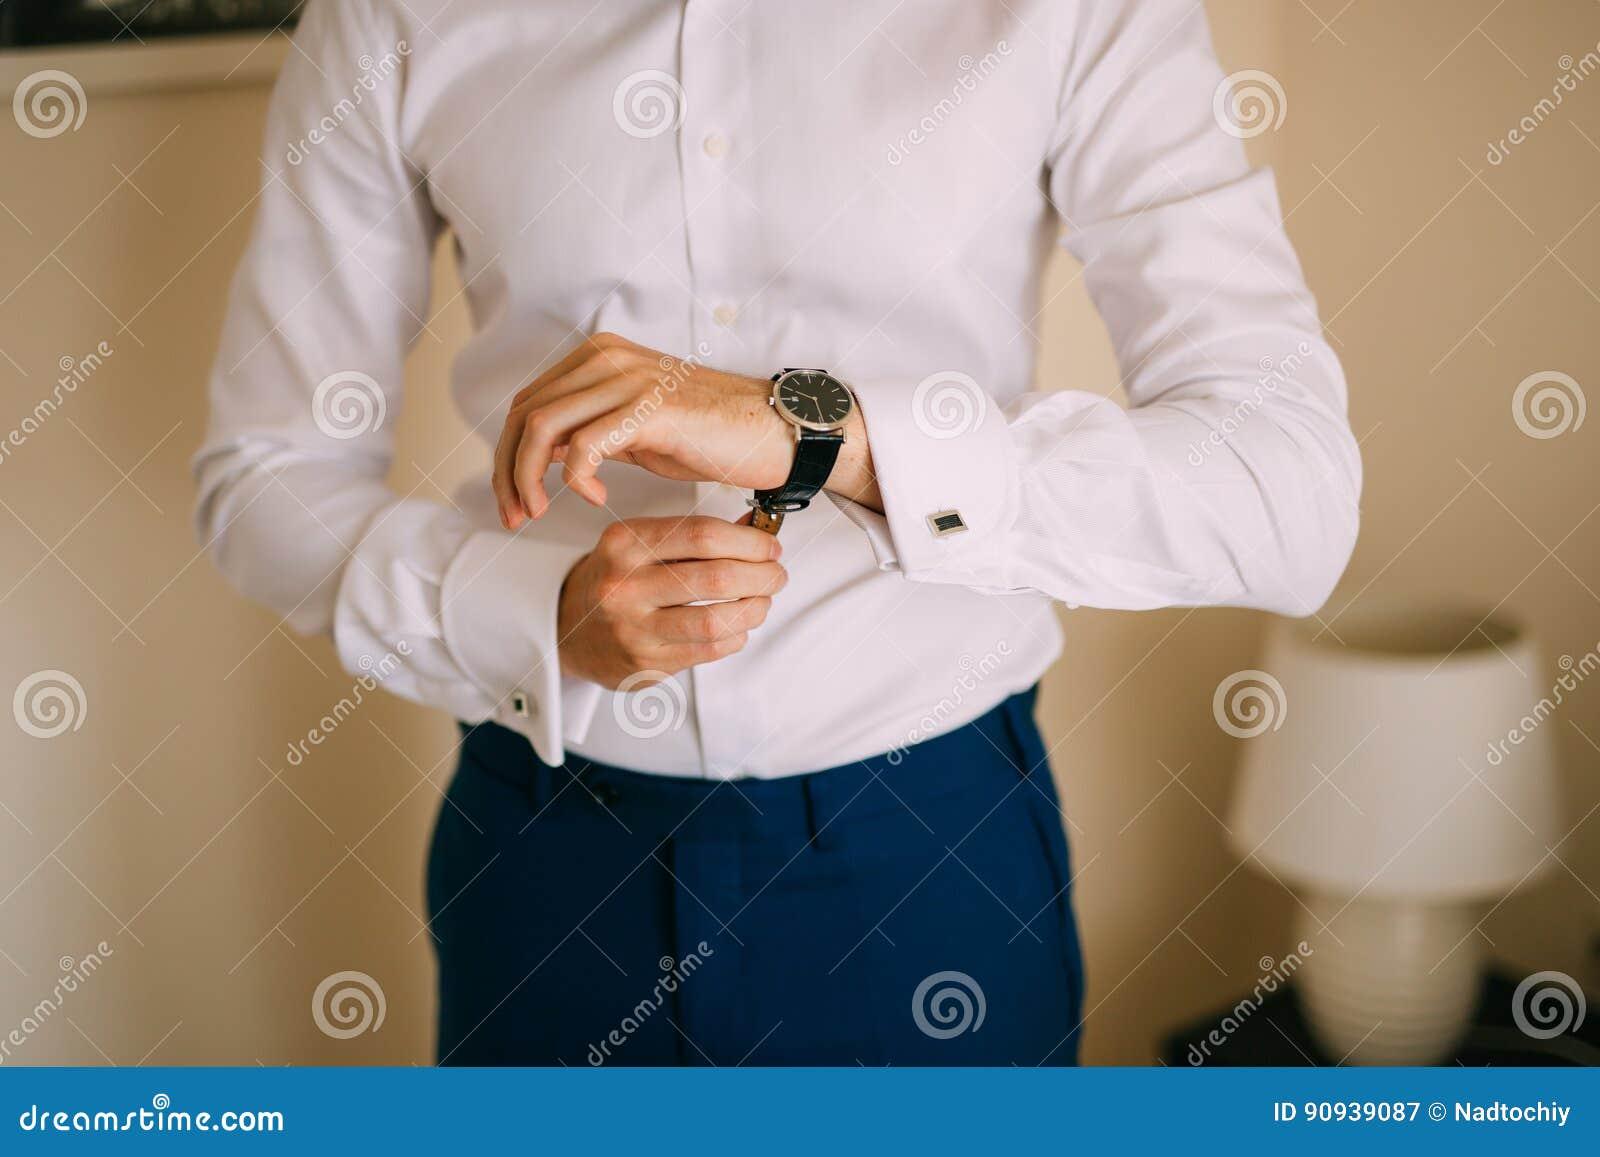 49a54e7efc03 Το άτομο κουμπώνει το μανικετόκουμπο στο γαλλικό άσπρο πουκάμισο  πολυτέλειας μανικιών μανσετών